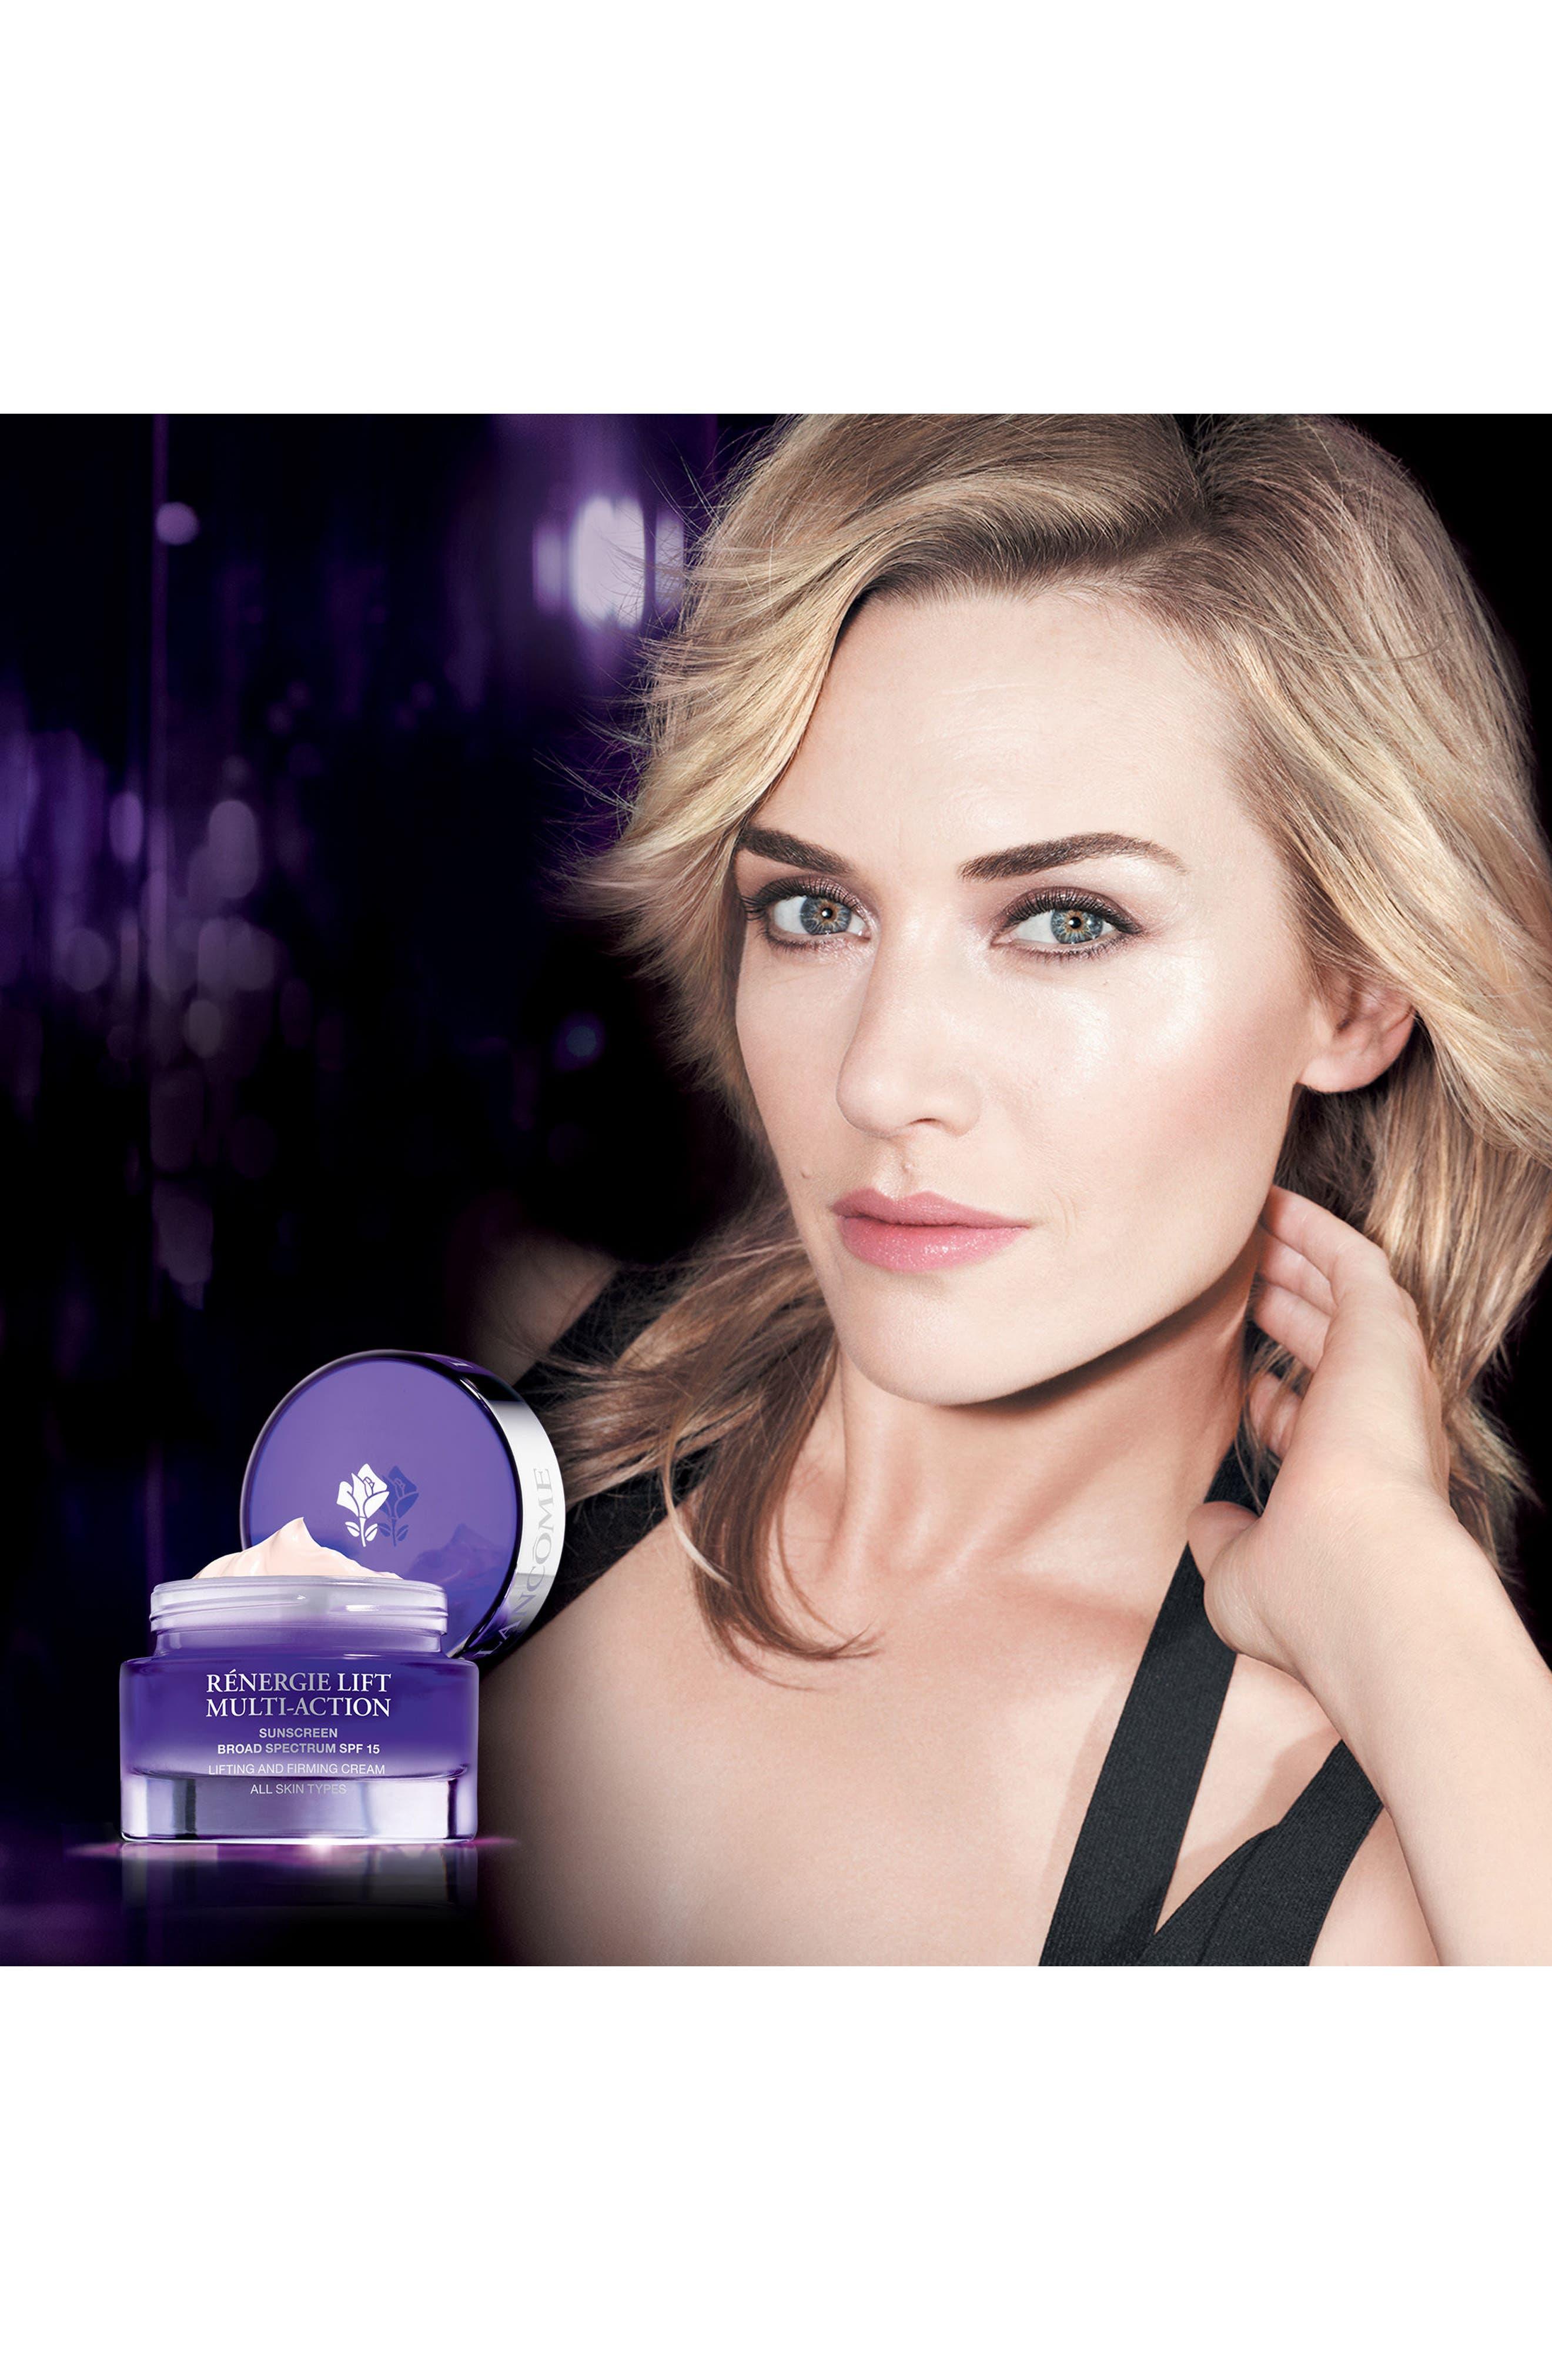 Rénergie Lift Multi Action Moisturizer Cream SPF 15 for Dry Skin,                             Alternate thumbnail 4, color,                             NO COLOR